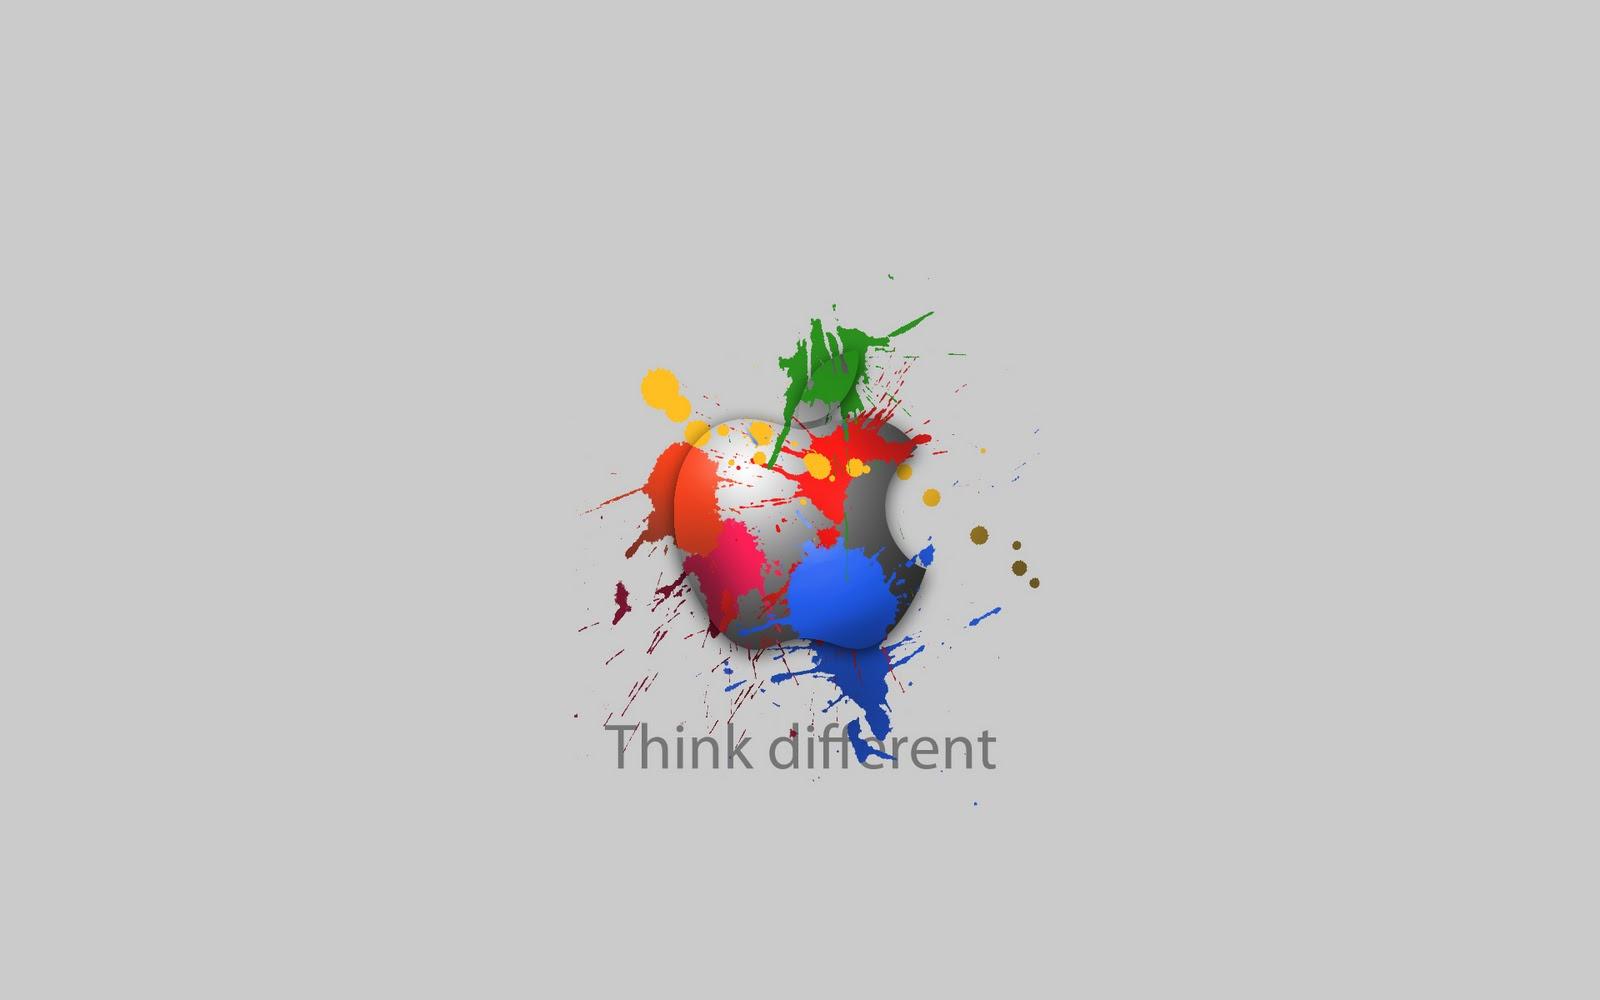 Desktop Wallpapers Imac Something Different